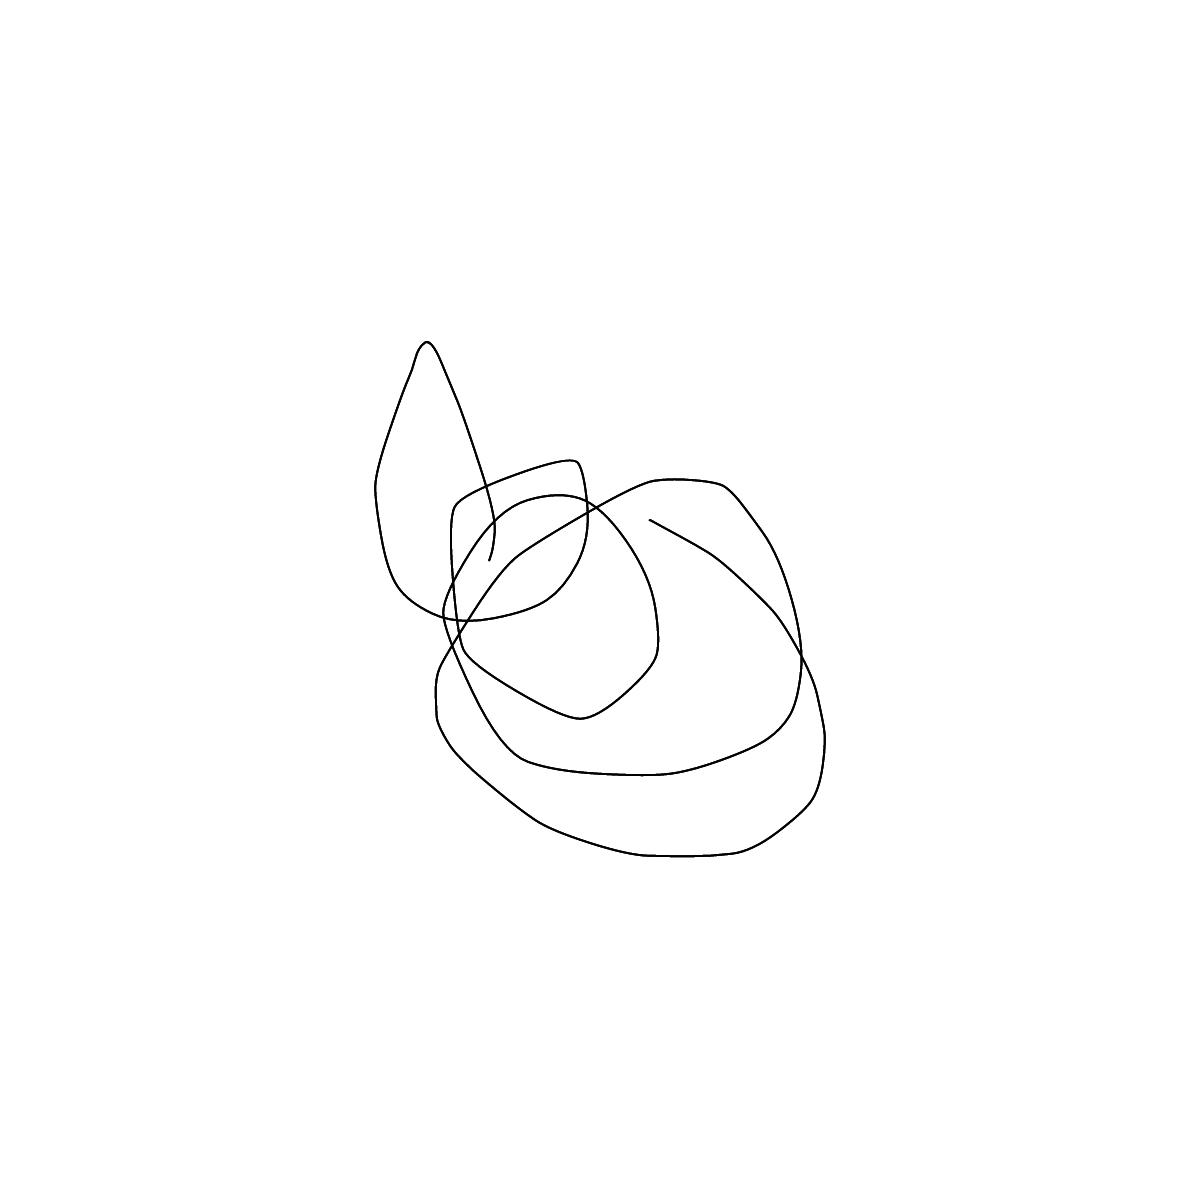 BAAAM drawing#24135 lat:59.8006362915039060lng: 20.9179935455322270